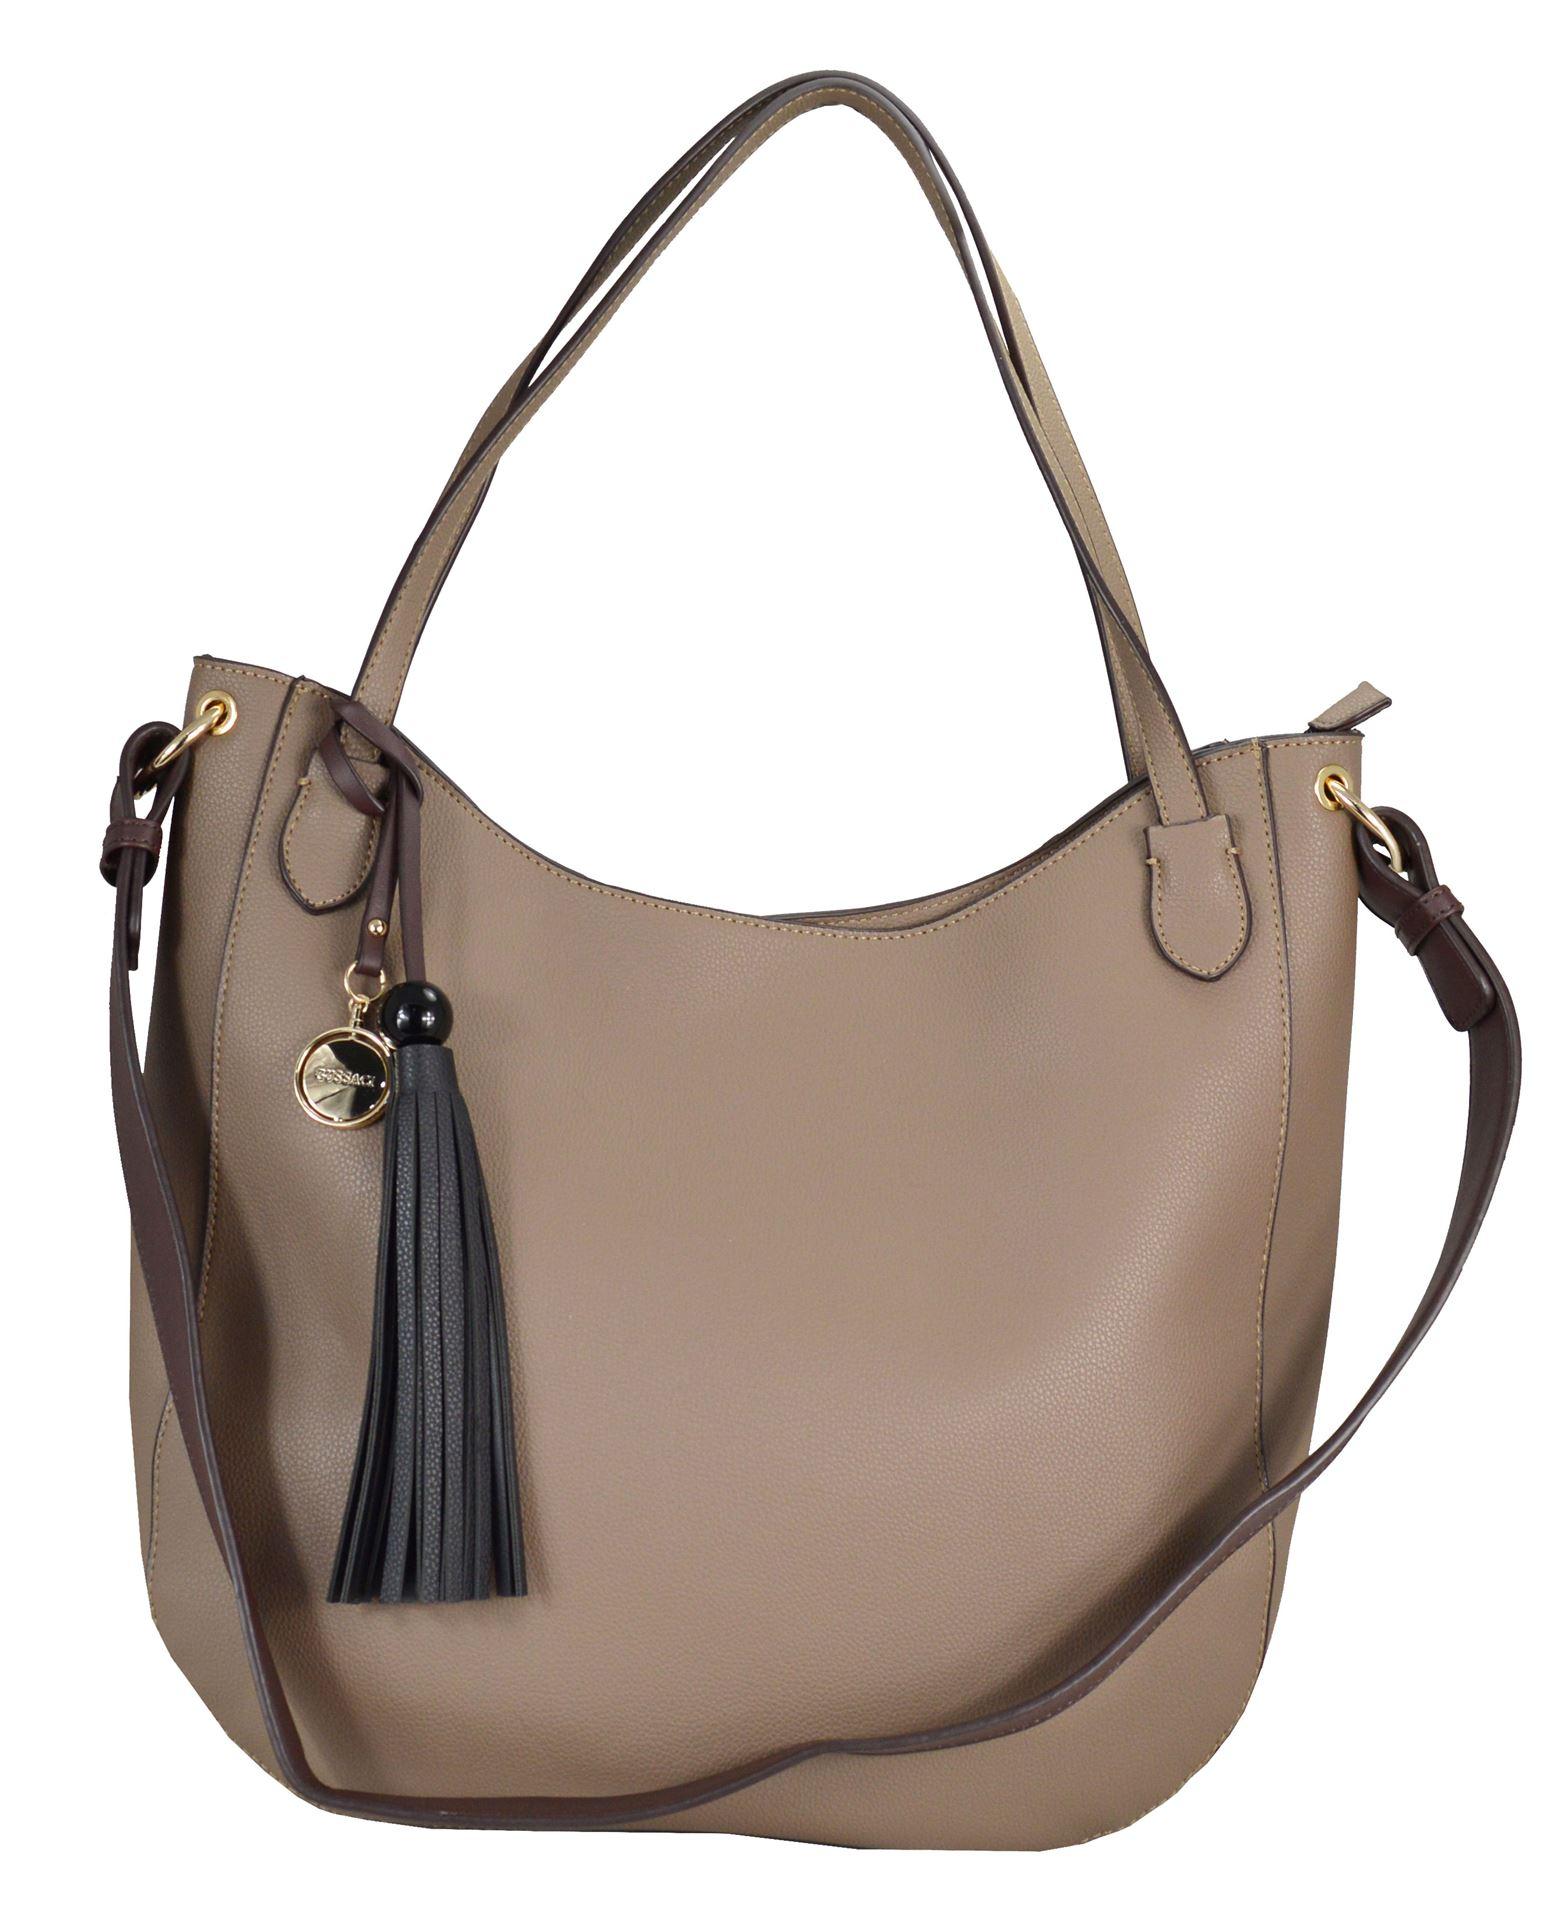 5253701c30 Γυναικεία τσάντα ώμου GUS-18s04 taupe